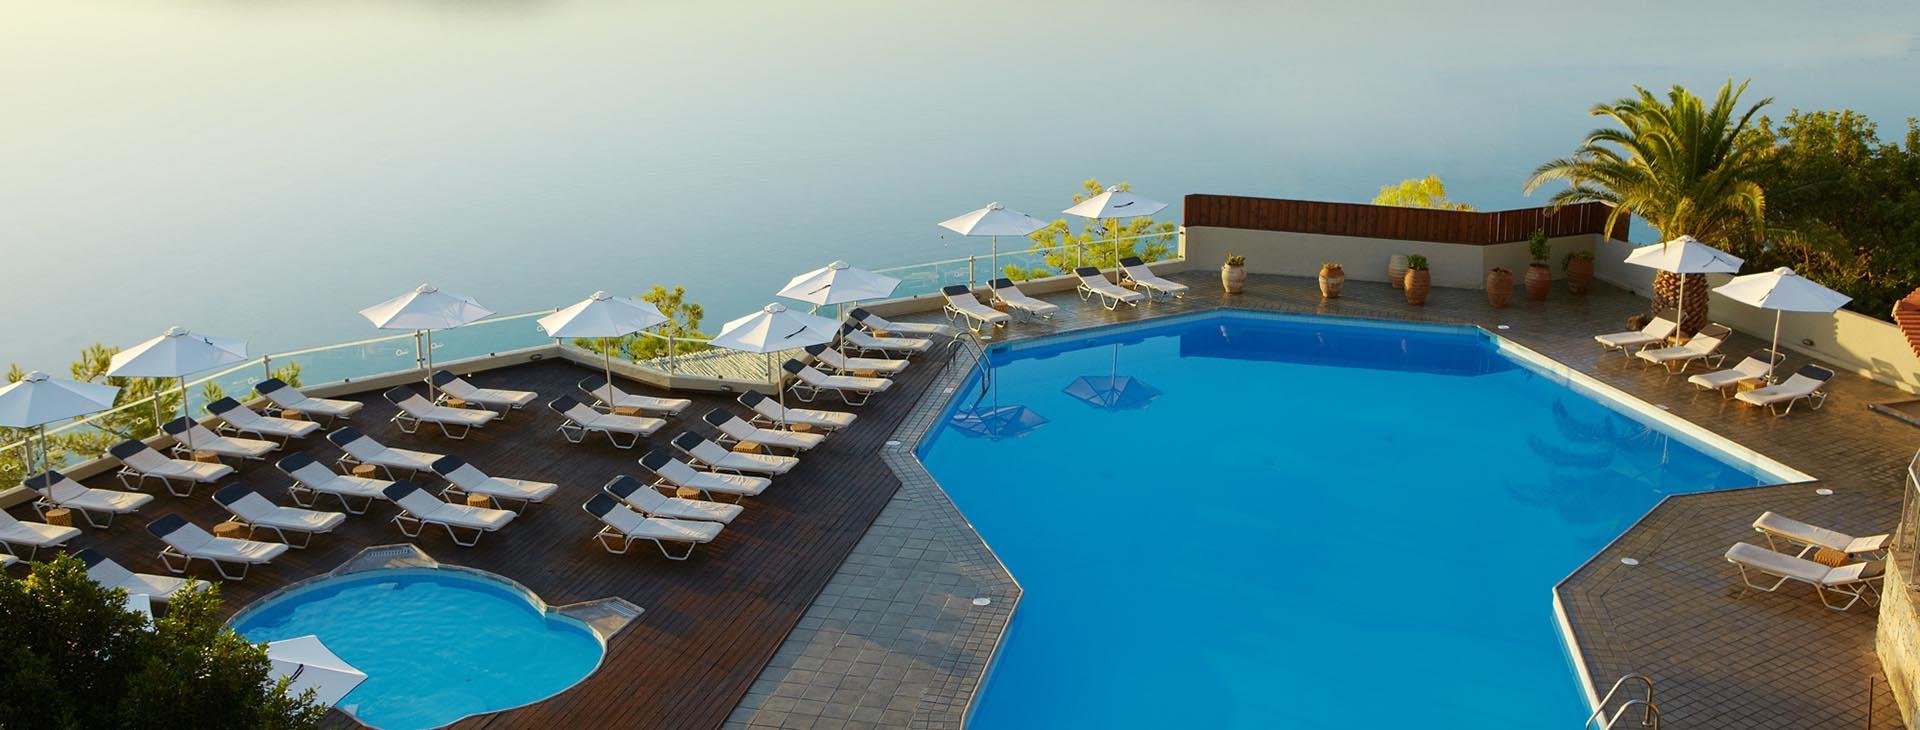 Sentido Elounda Blu Hotel - Adult Only Hotel